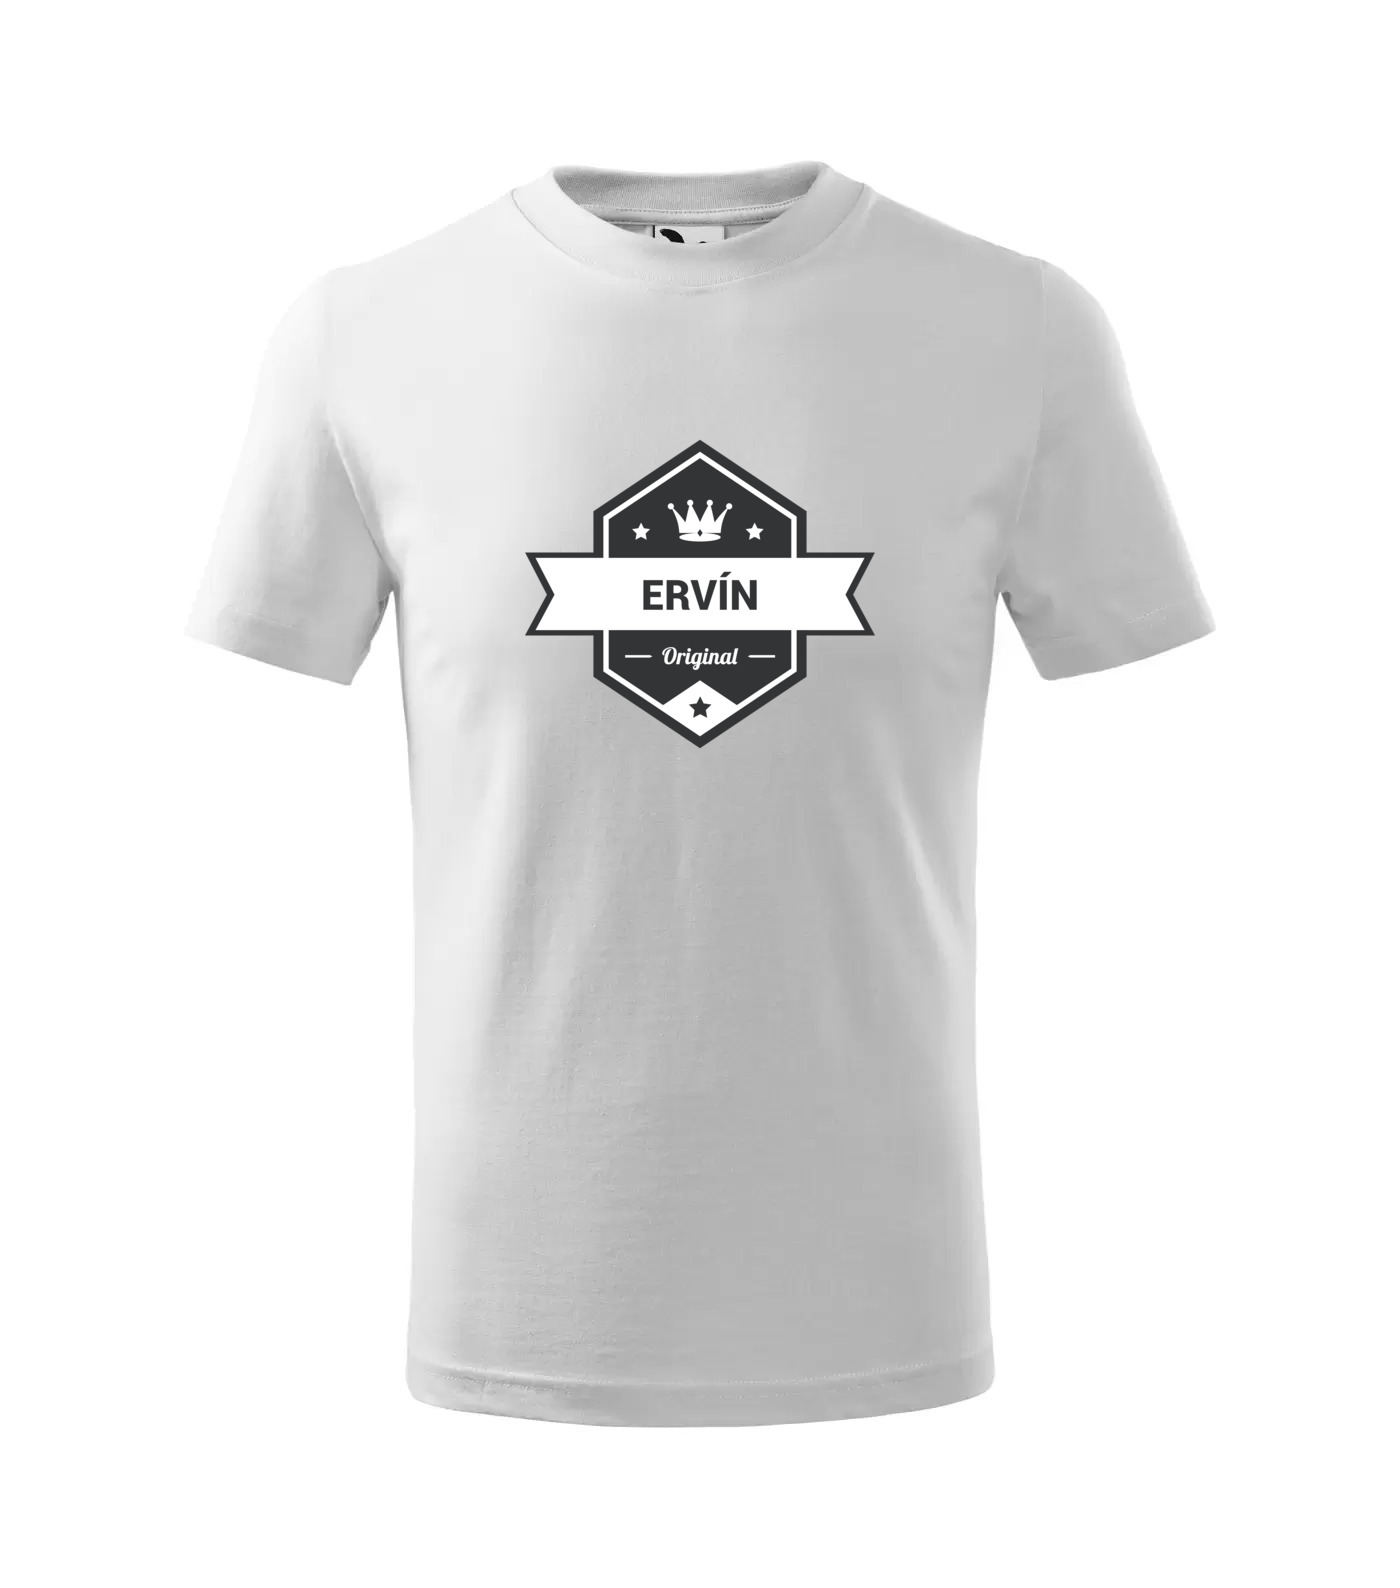 Tričko King Ervín